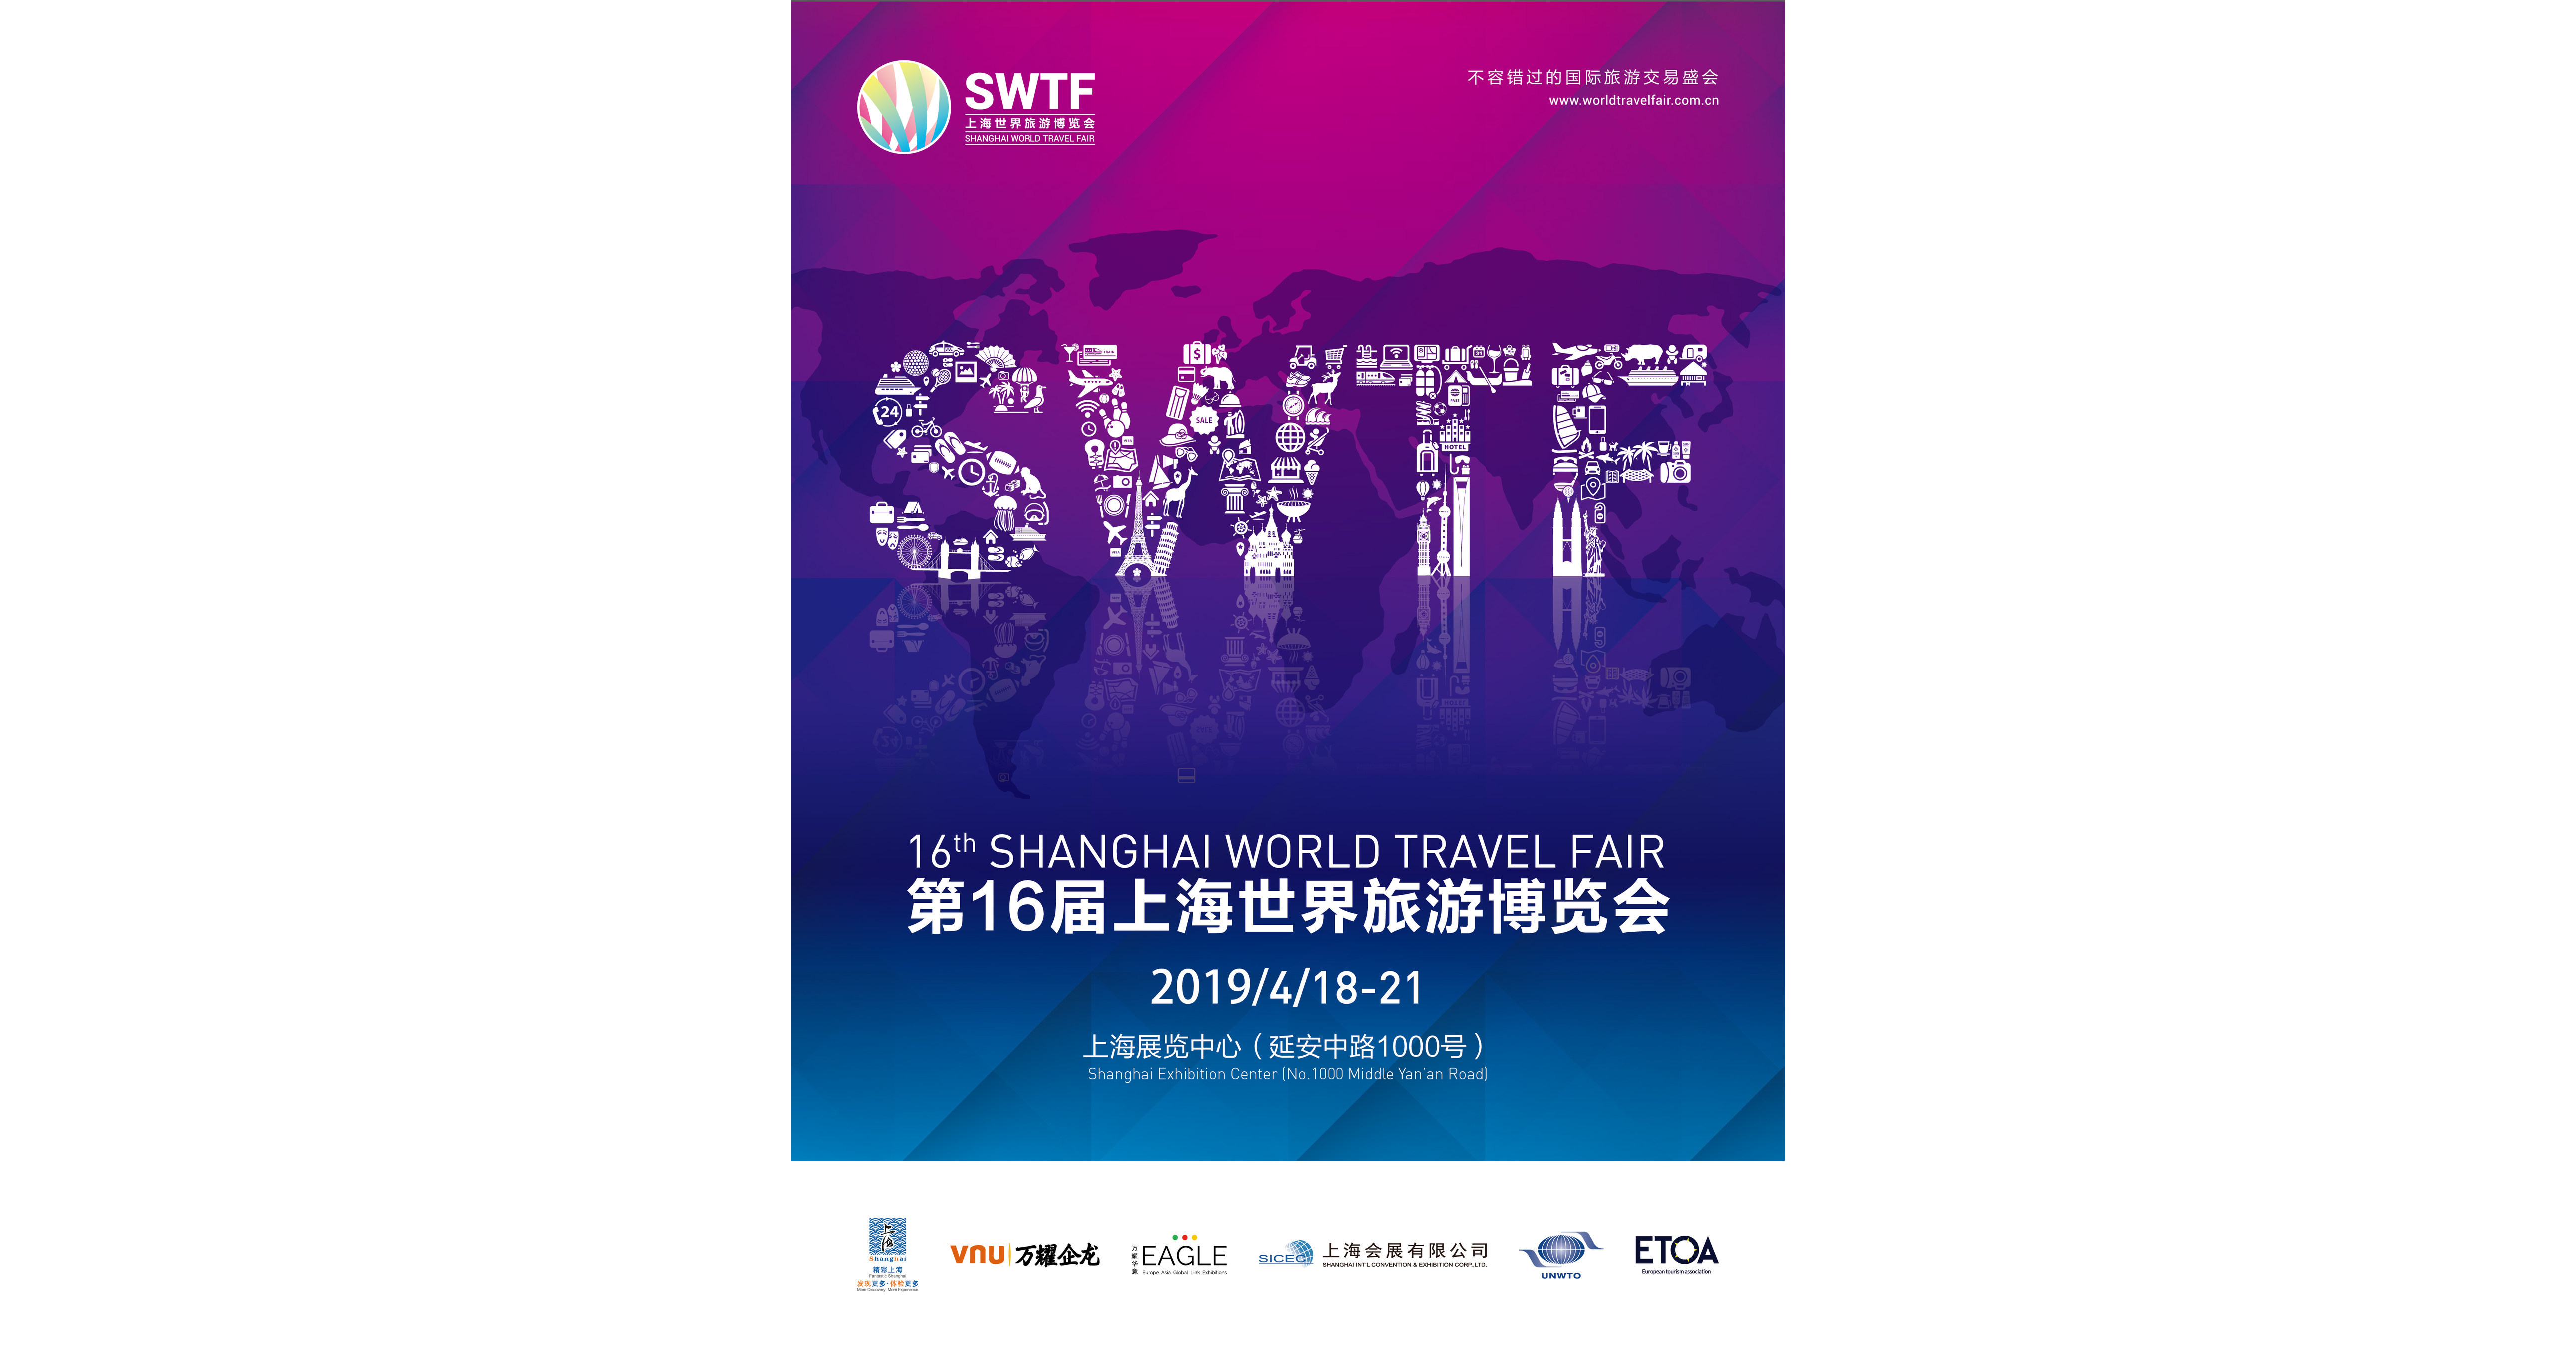 16th Shanghai World Travel Fair - a Professional Platform Dedicated to China Outbound Tourism Market